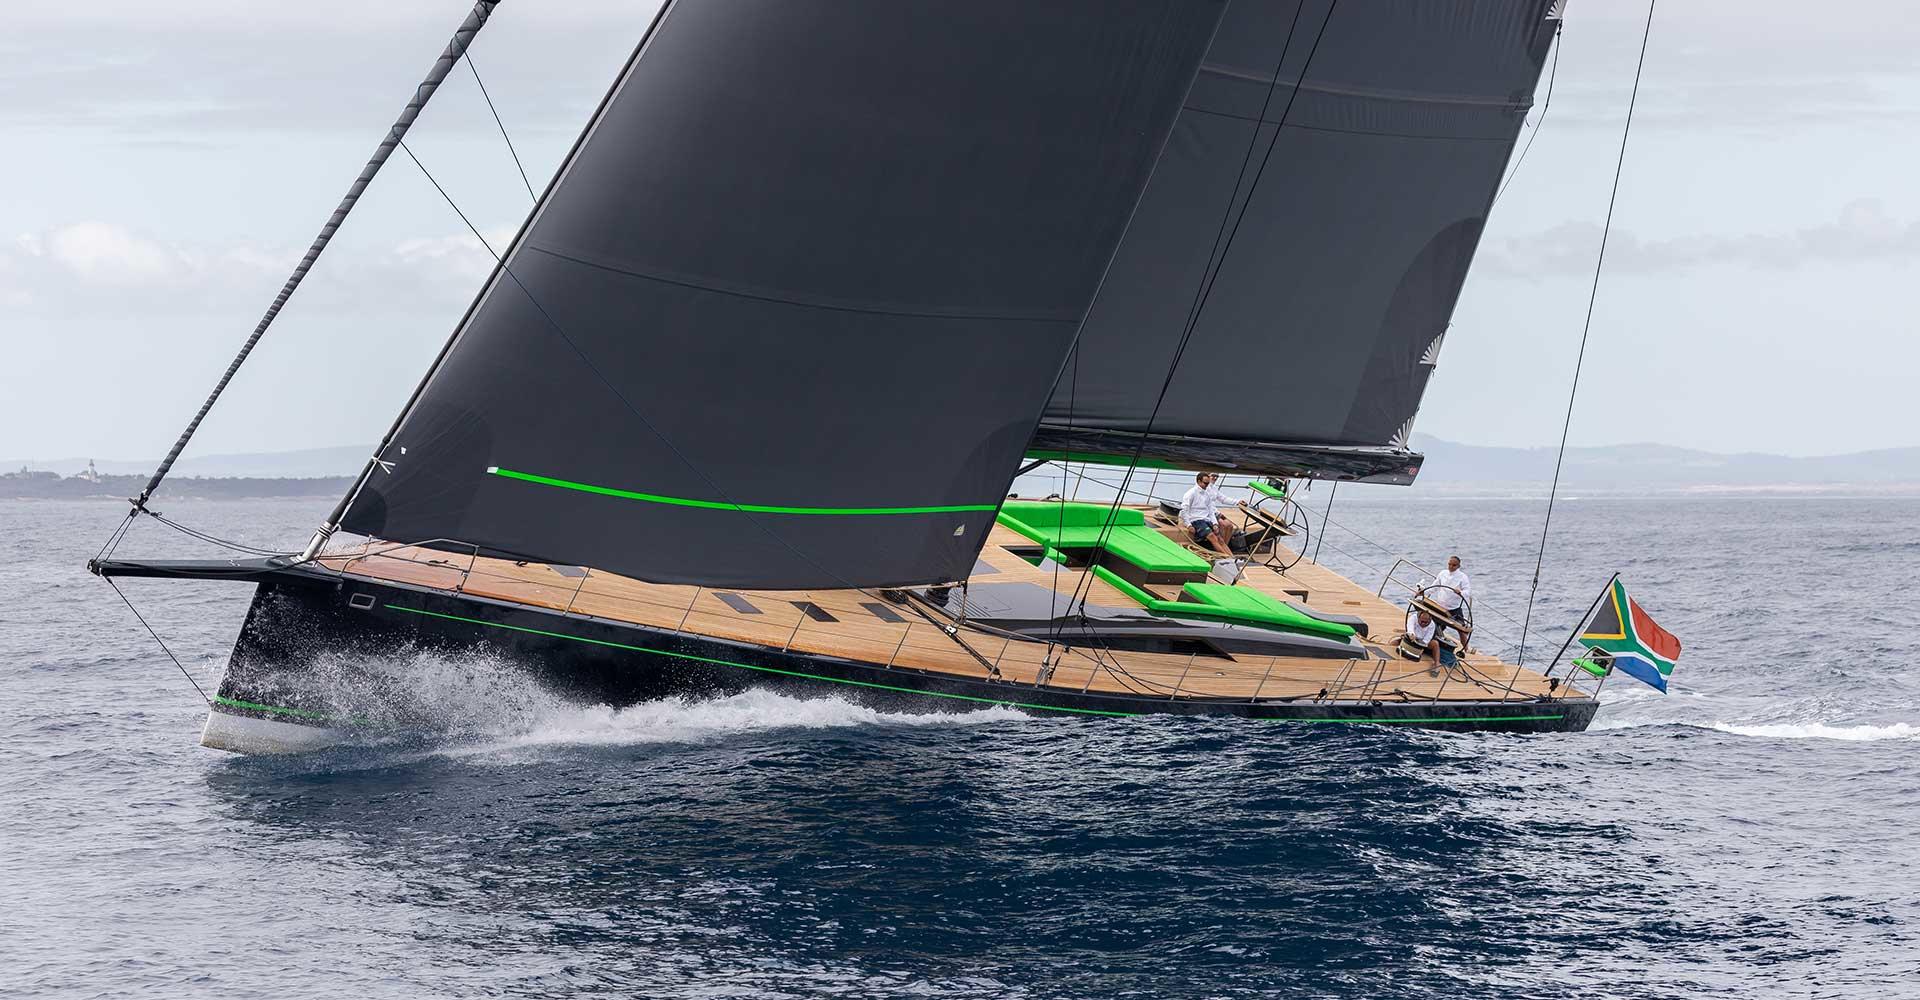 Monaco Yacht Show 2021 with Ulysse Nardin - Southern Wind Morgana luxury sailing yacht